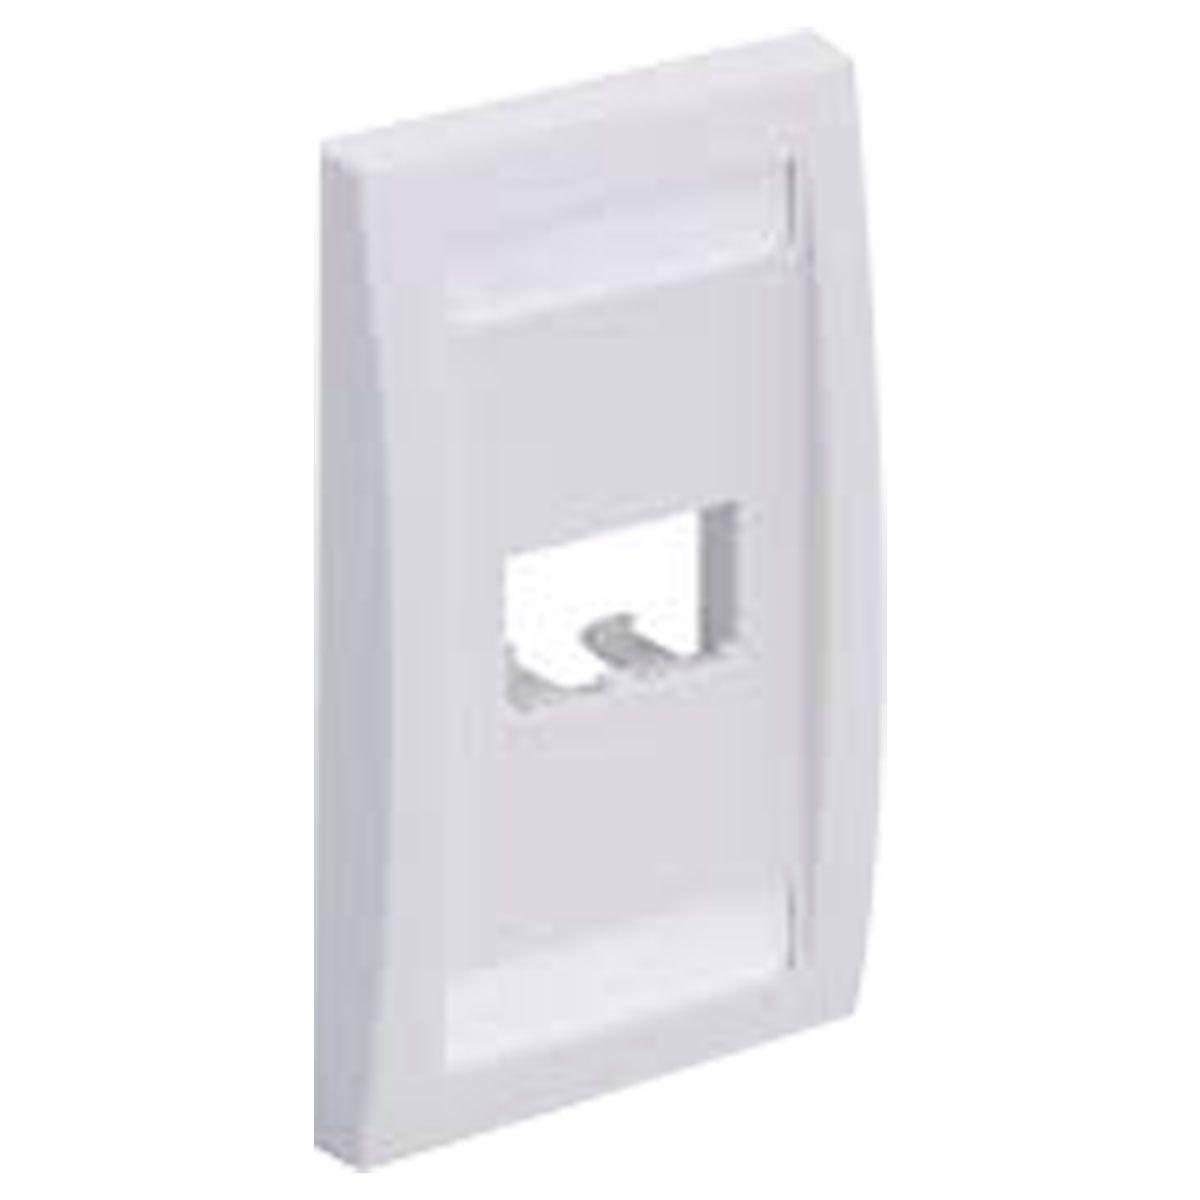 Faceplate minicom 2 módulos Panduit CFPE2WHY